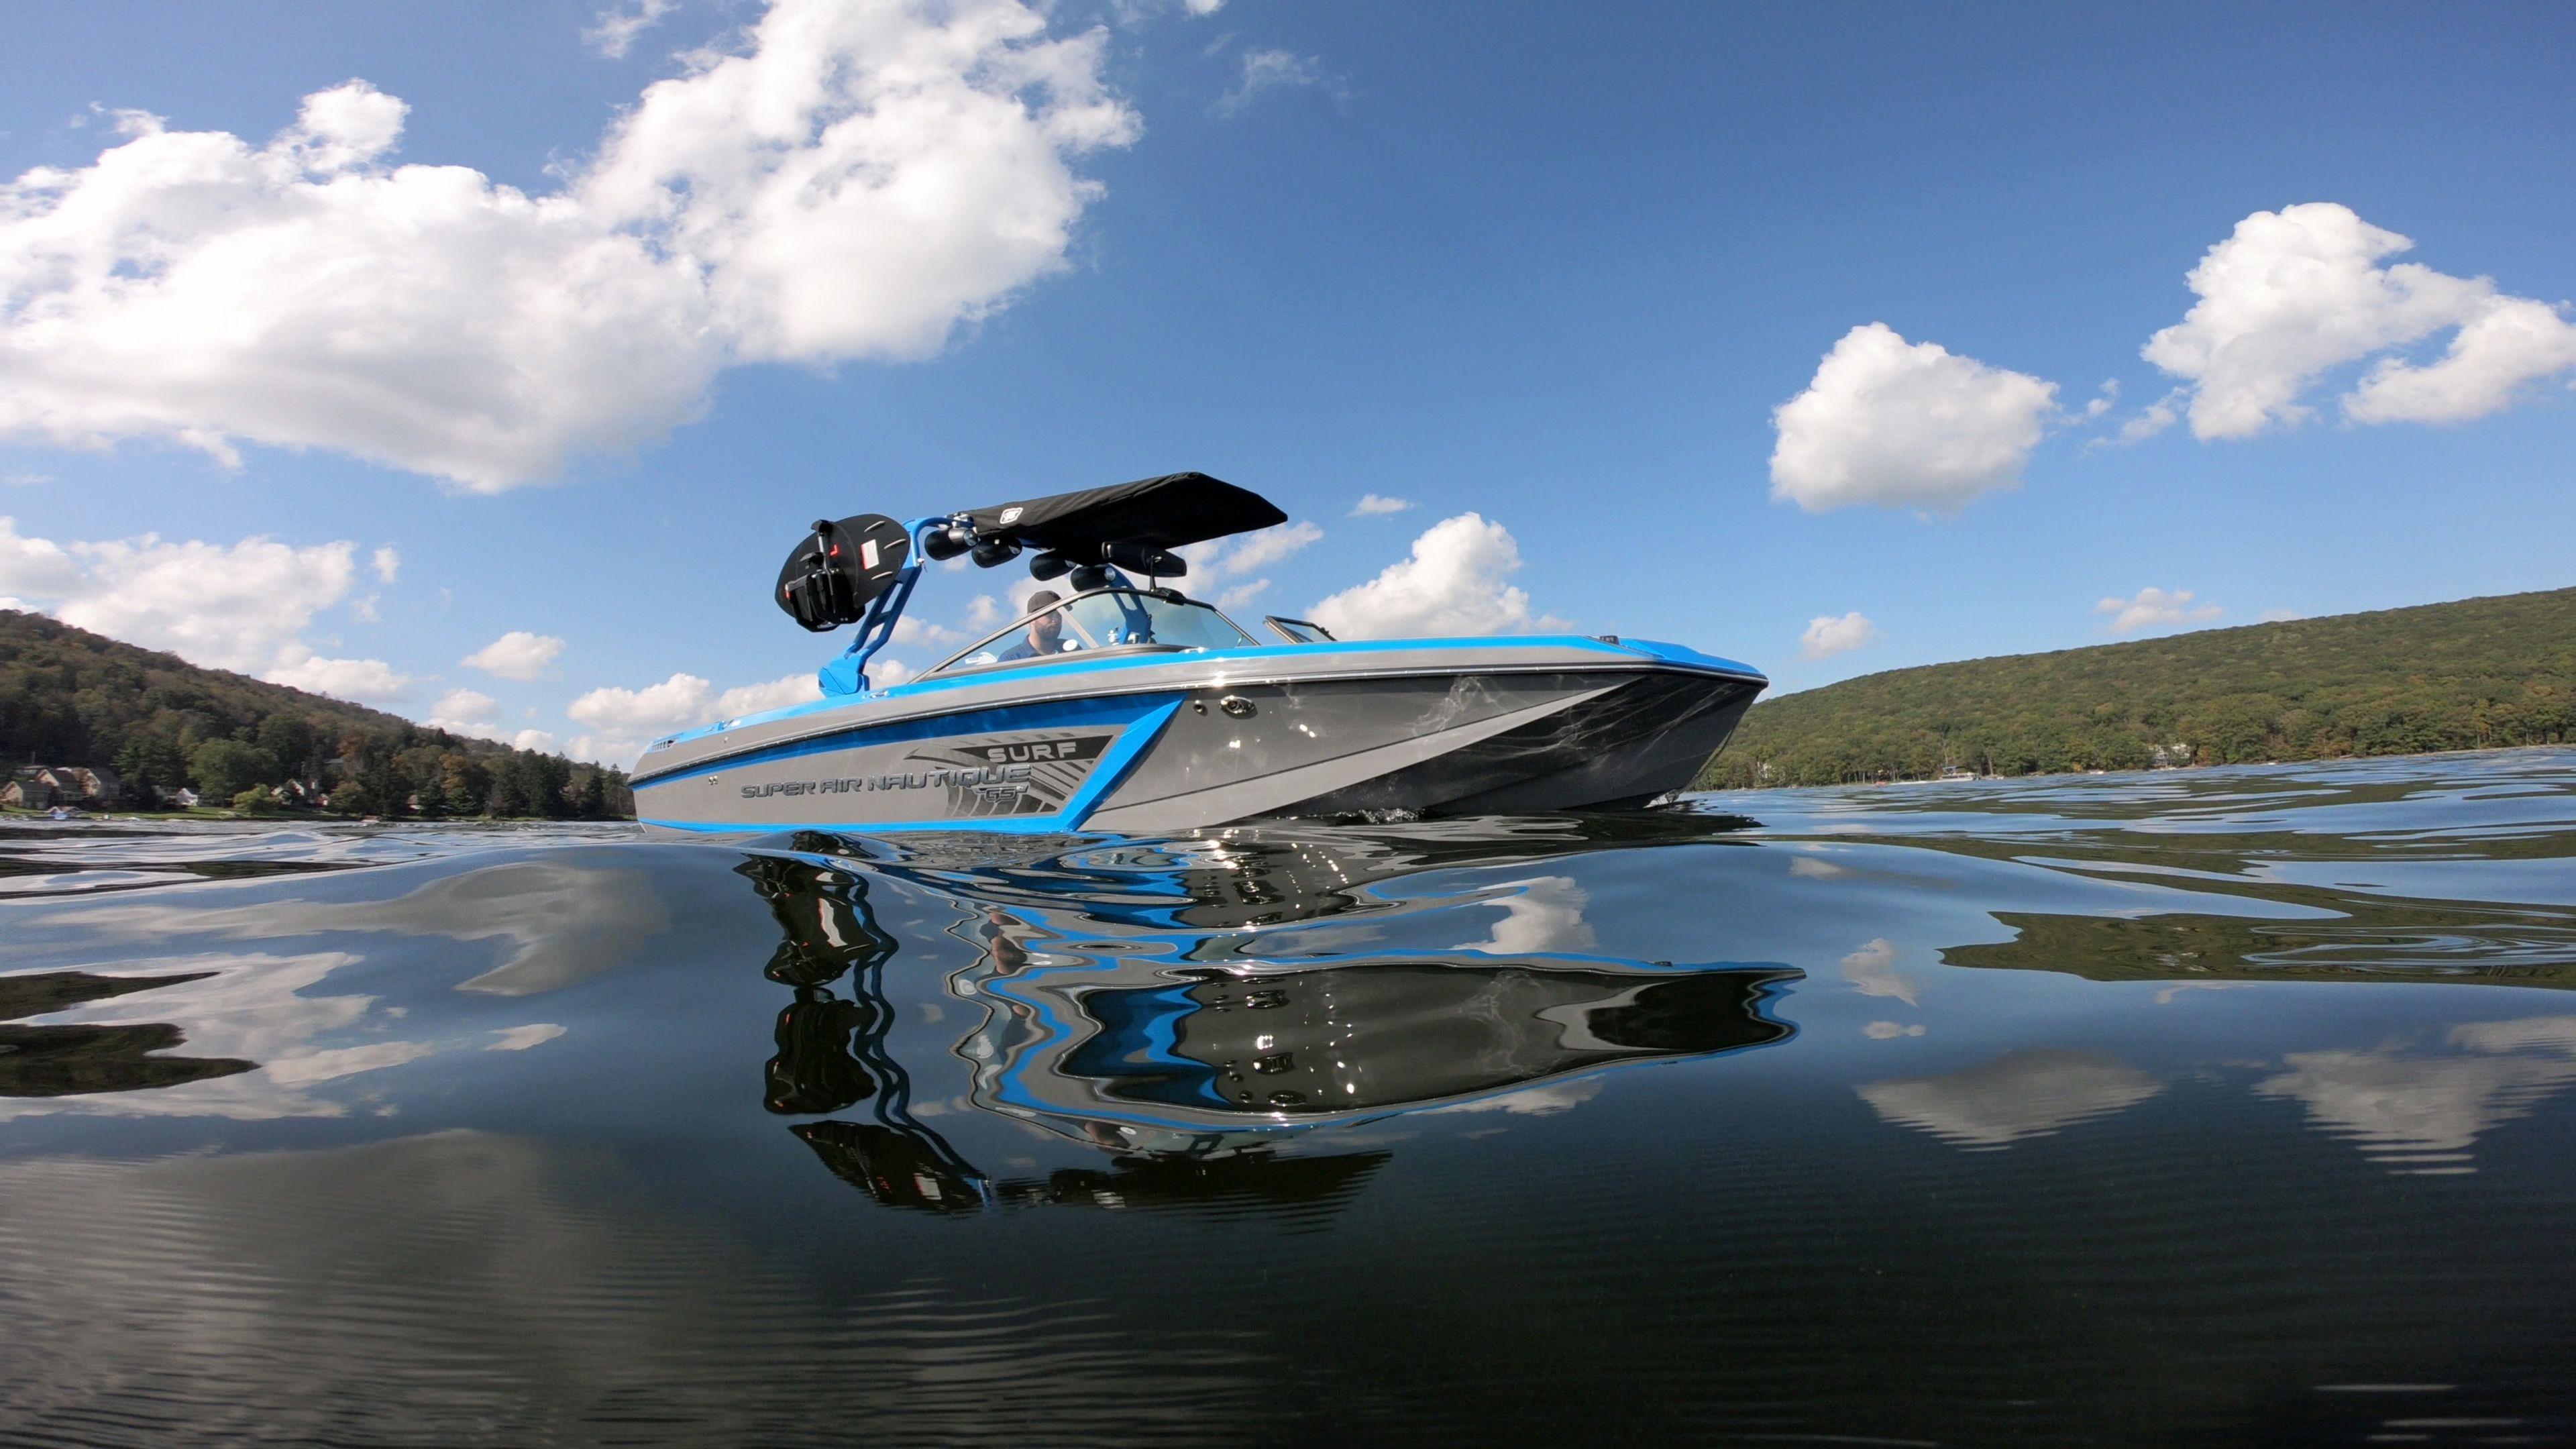 2019 Nautique Gs24 Deep Creek Lake Lake Boat Lake